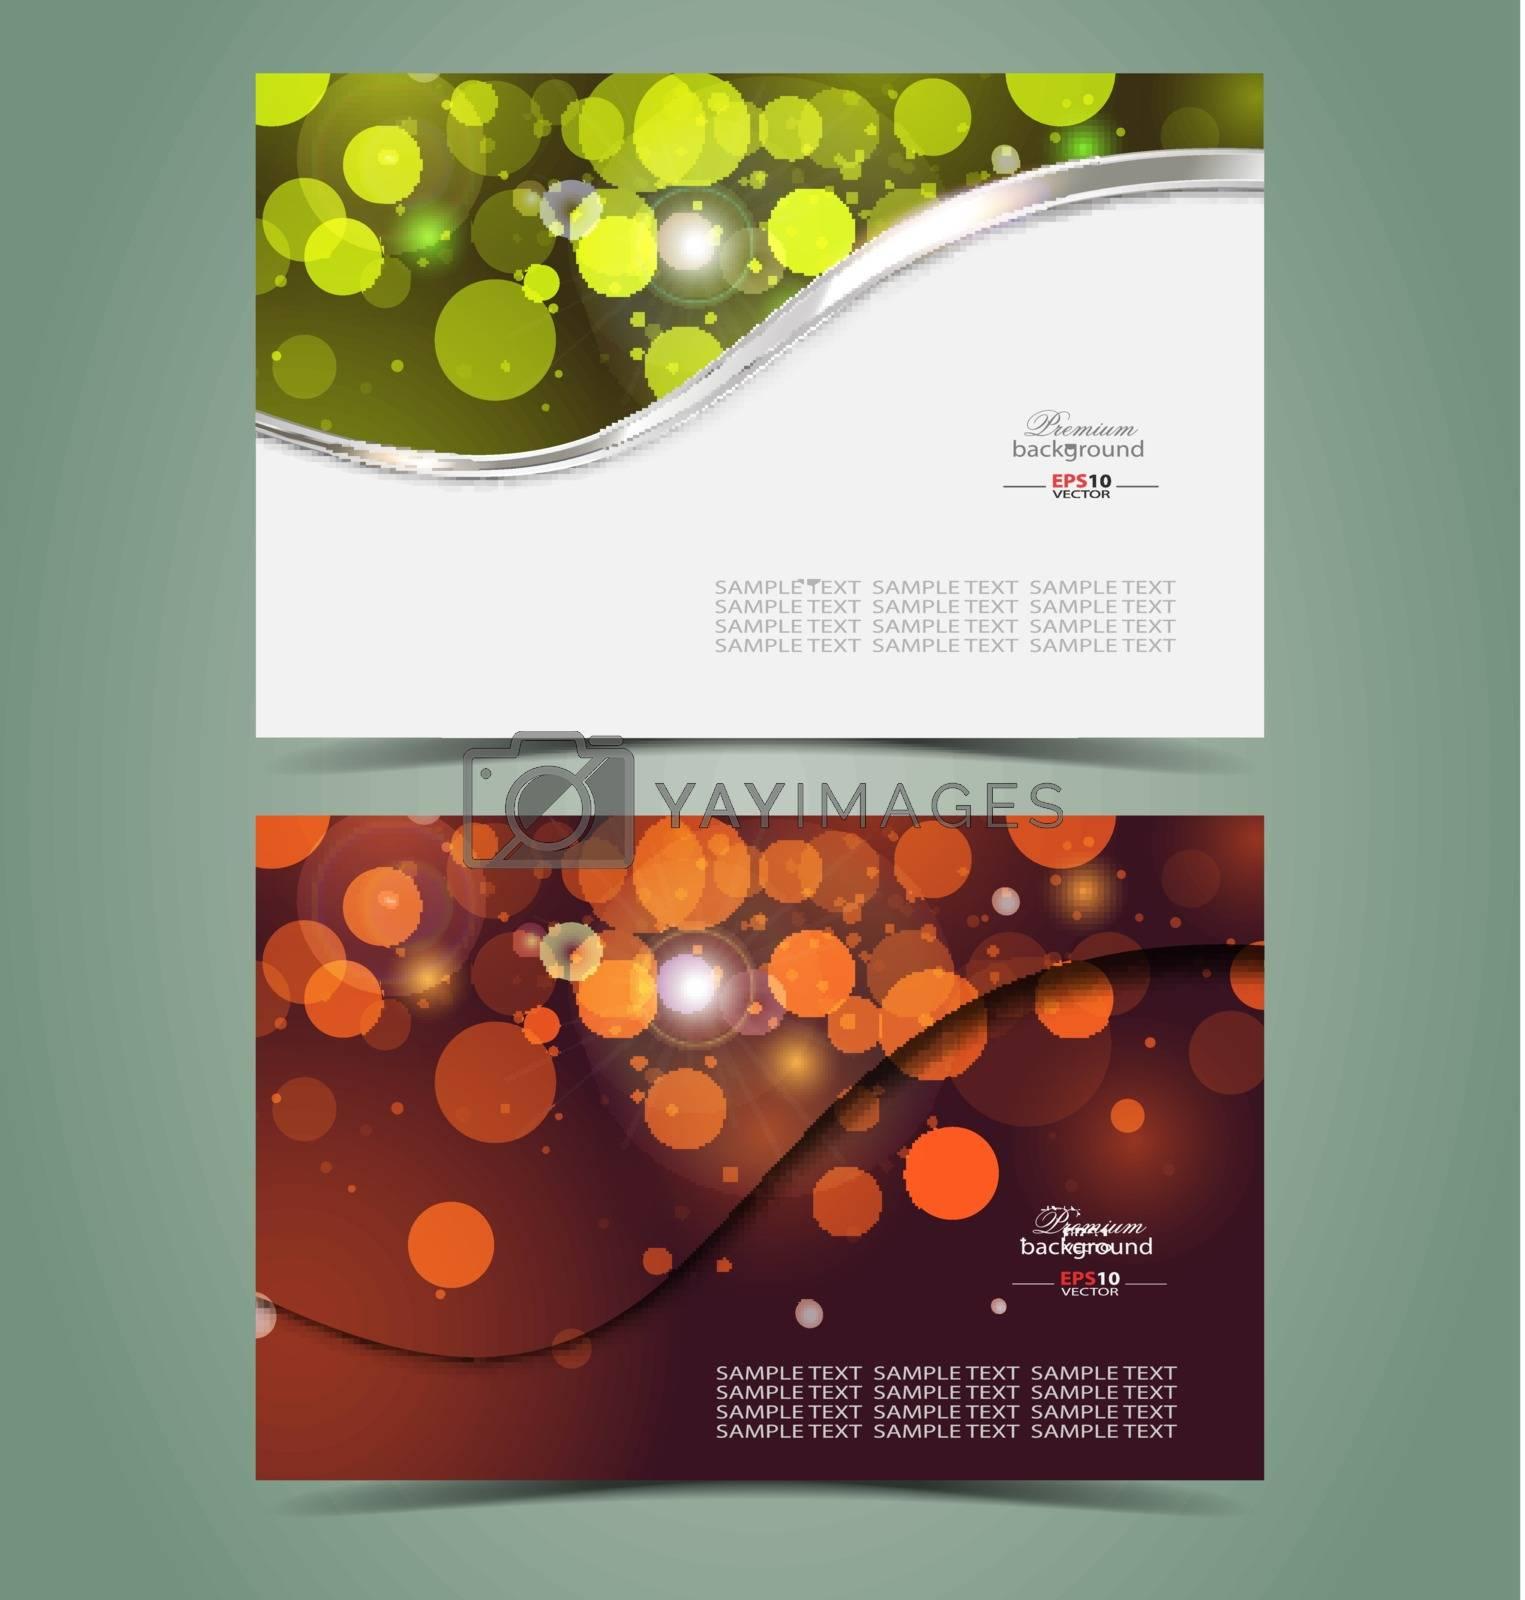 Elegant business card design template for creative needs